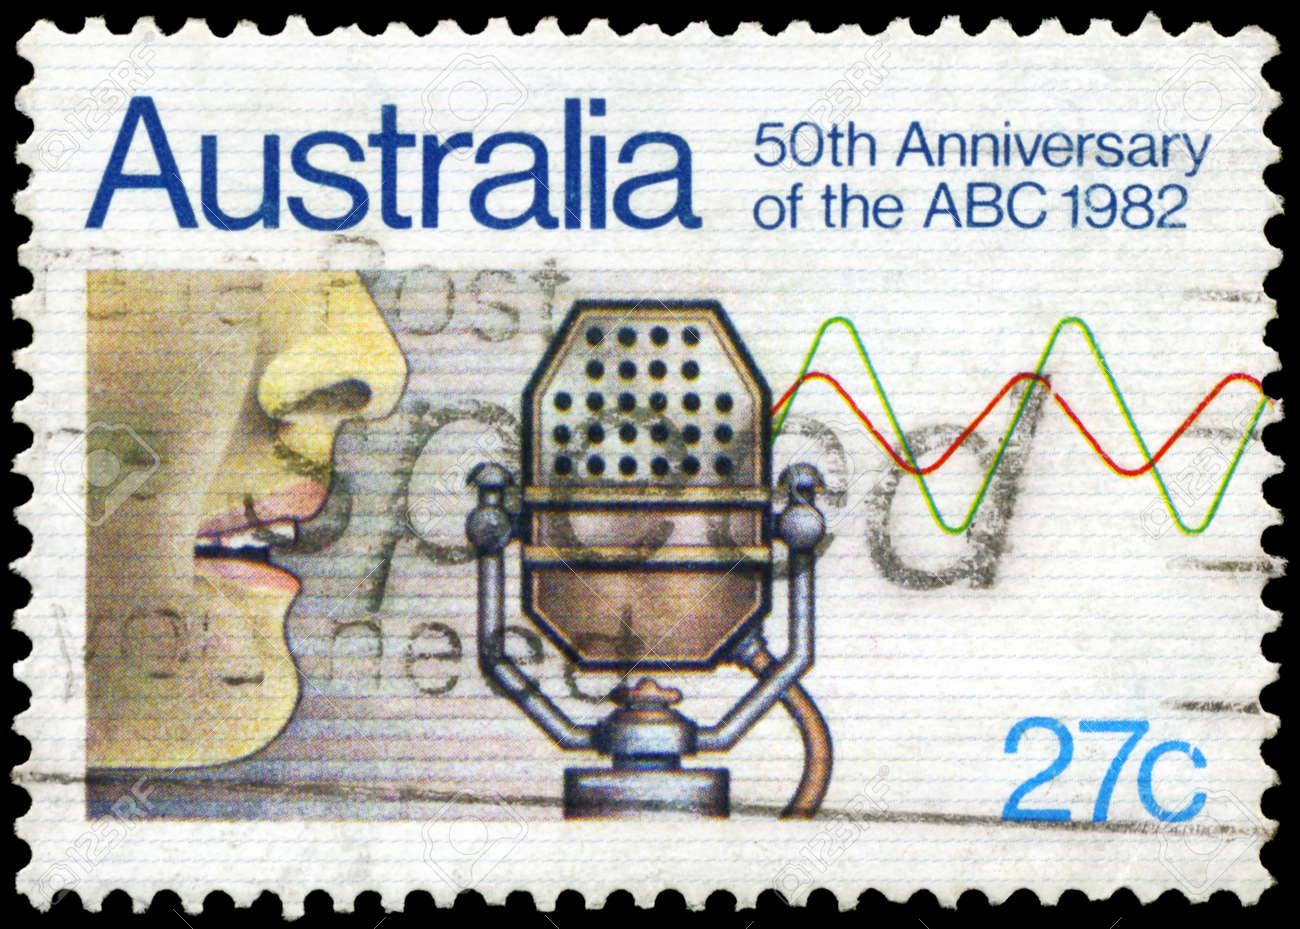 AUSTRALIA - CIRCA 1982: A Stamp printed in AUSTRALIA shows the Microphone, 50th annivesary of Australian Broadcasting Commission, circa 1982 Stock Photo - 17422779